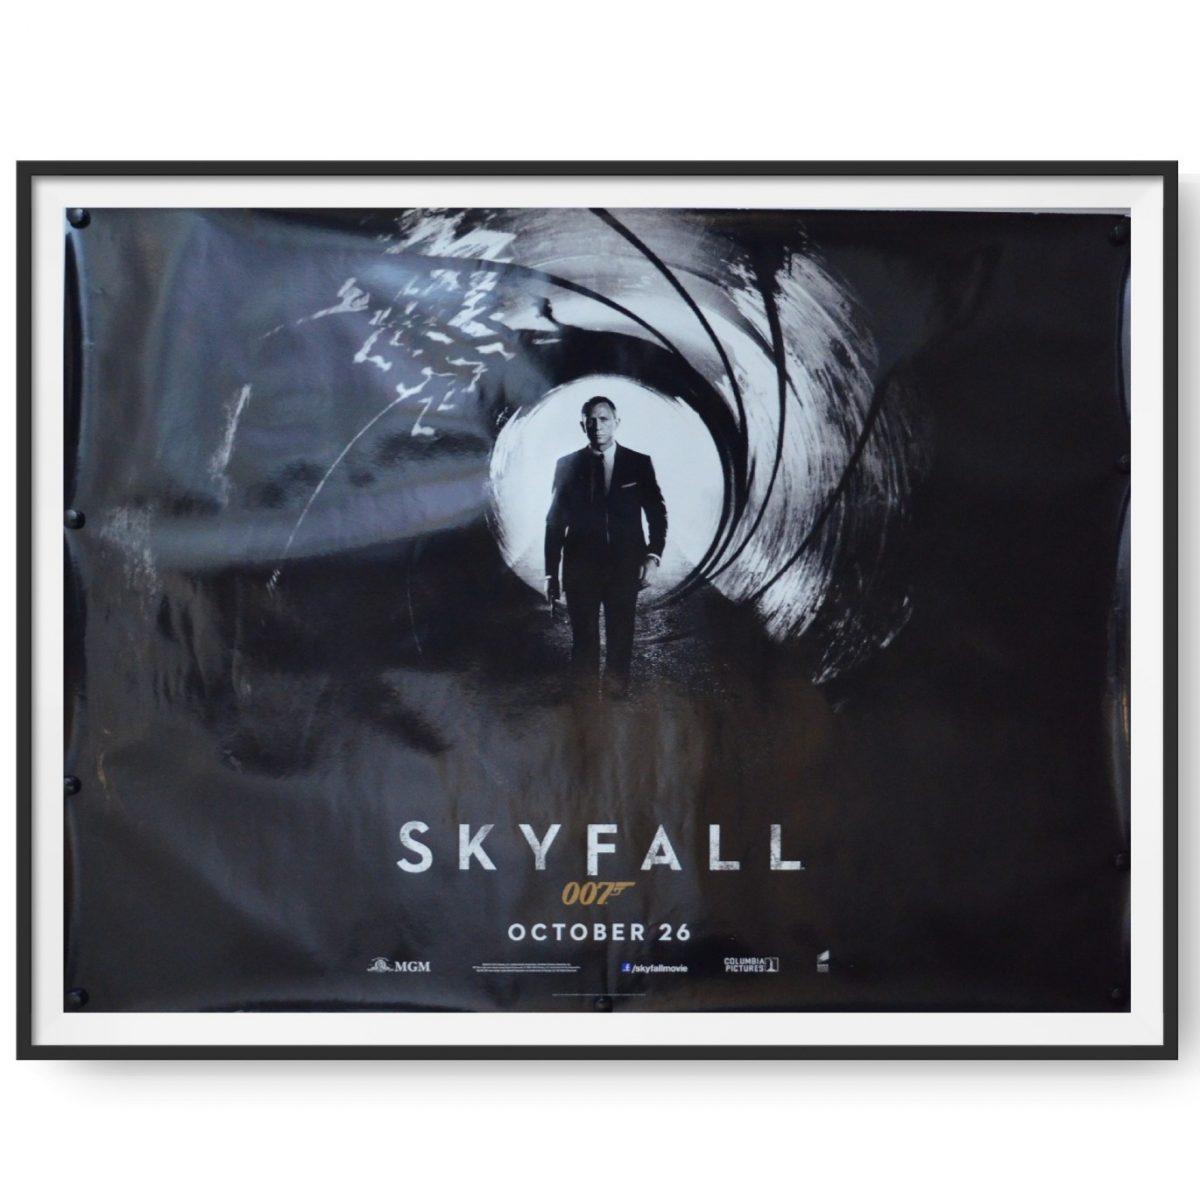 UK quad poster from the James Bond film Skyfall.